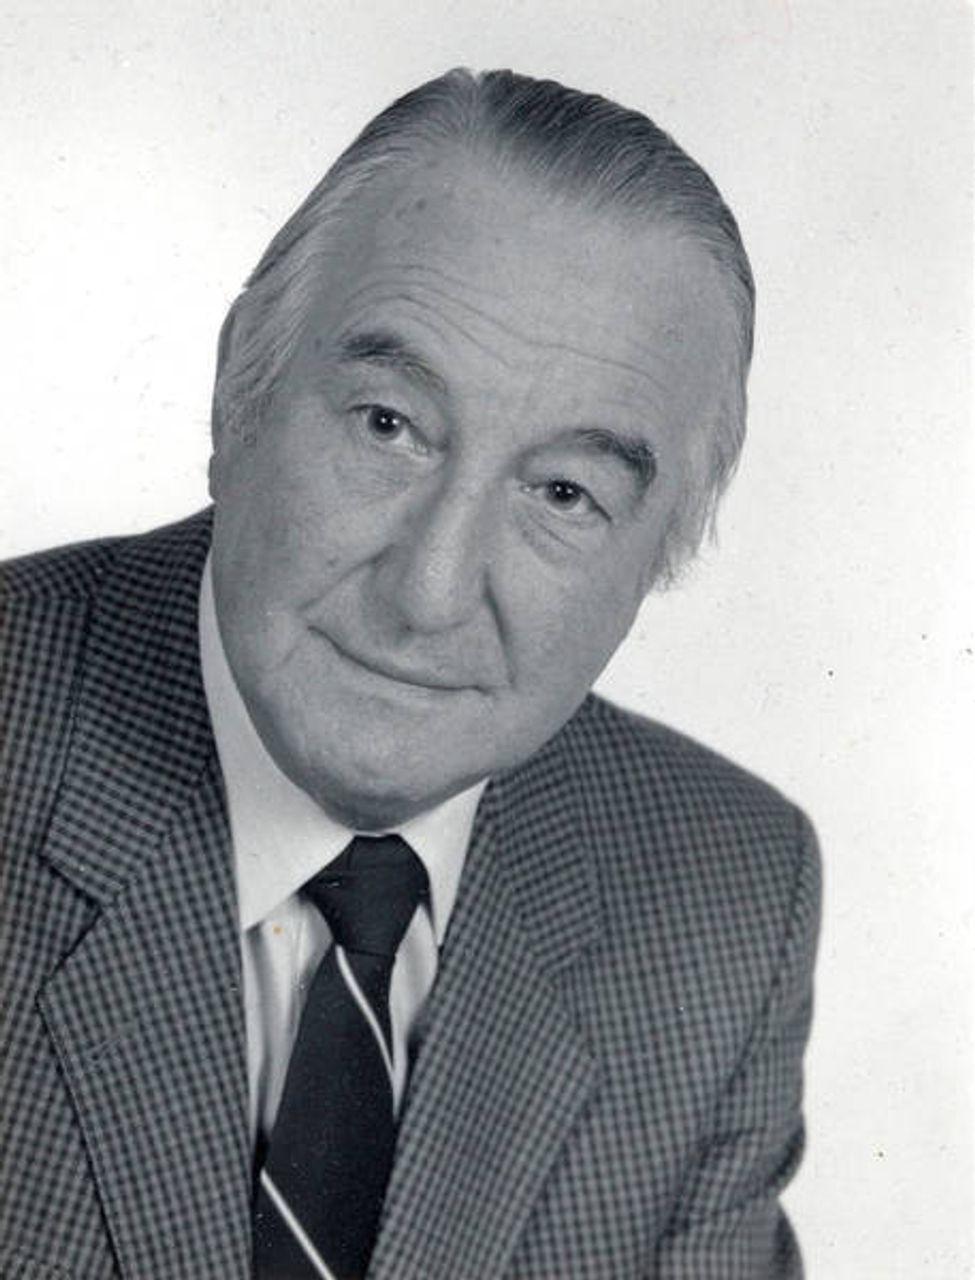 Eberhard Taubert